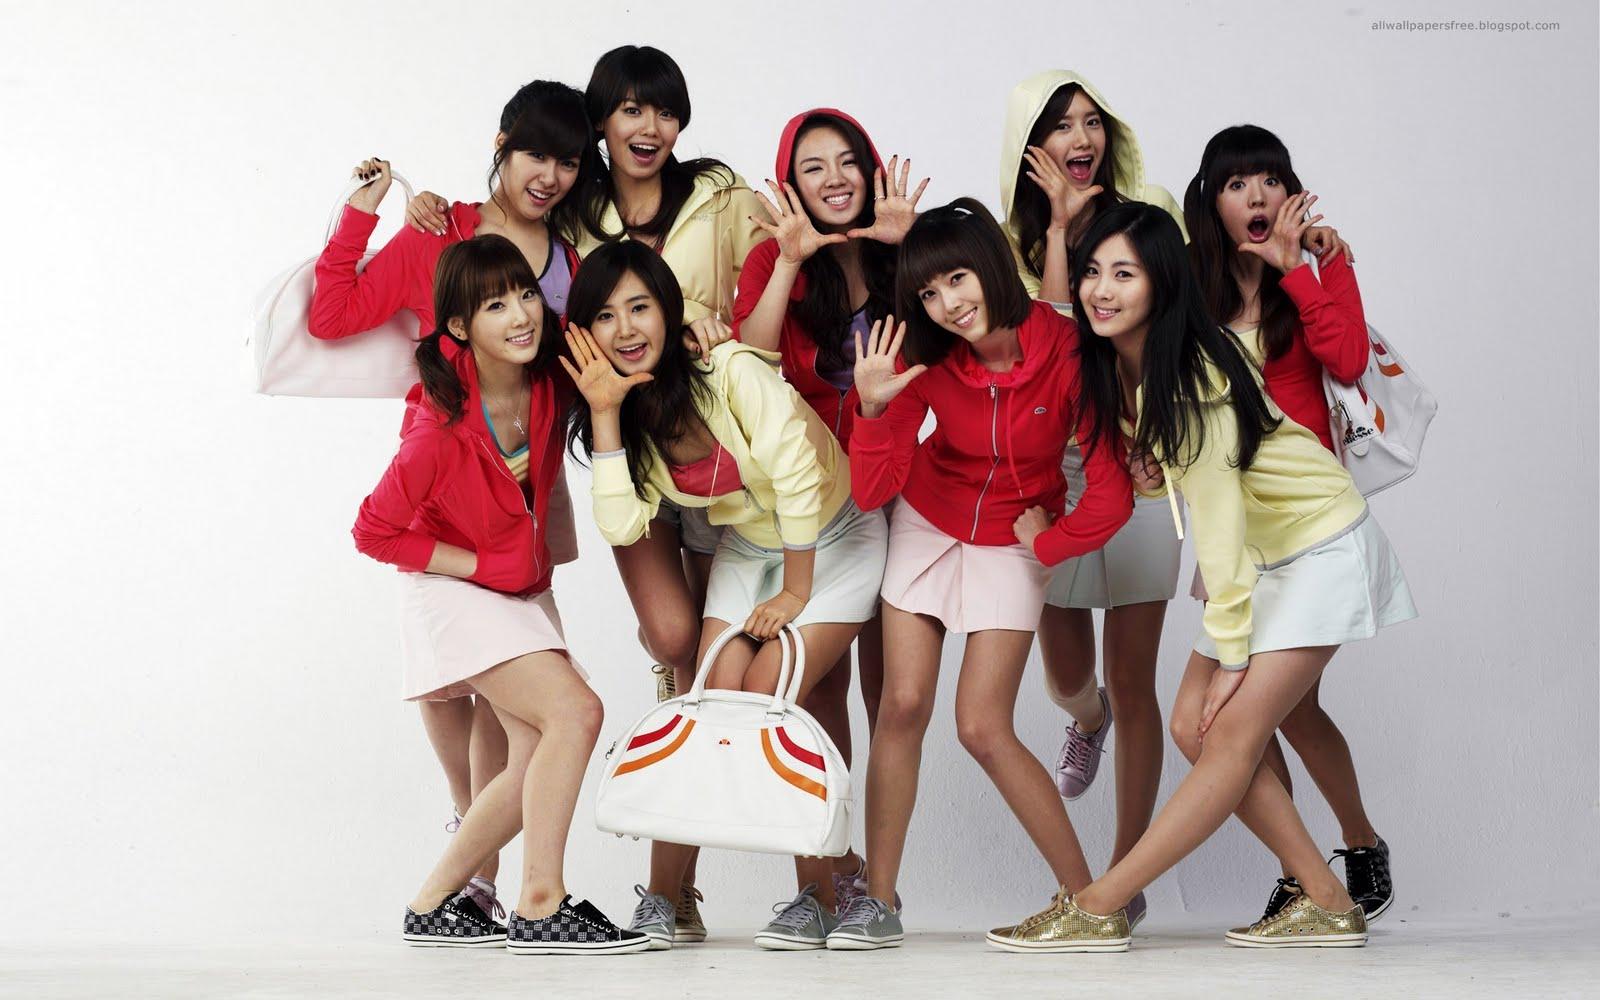 http://3.bp.blogspot.com/-KTdfdL9WnOs/TkTR7T1rt7I/AAAAAAAAANI/yRS9FN1XZ-Q/s1600/www.laba.ws_Asian_Girls_Generation_+0021.jpg